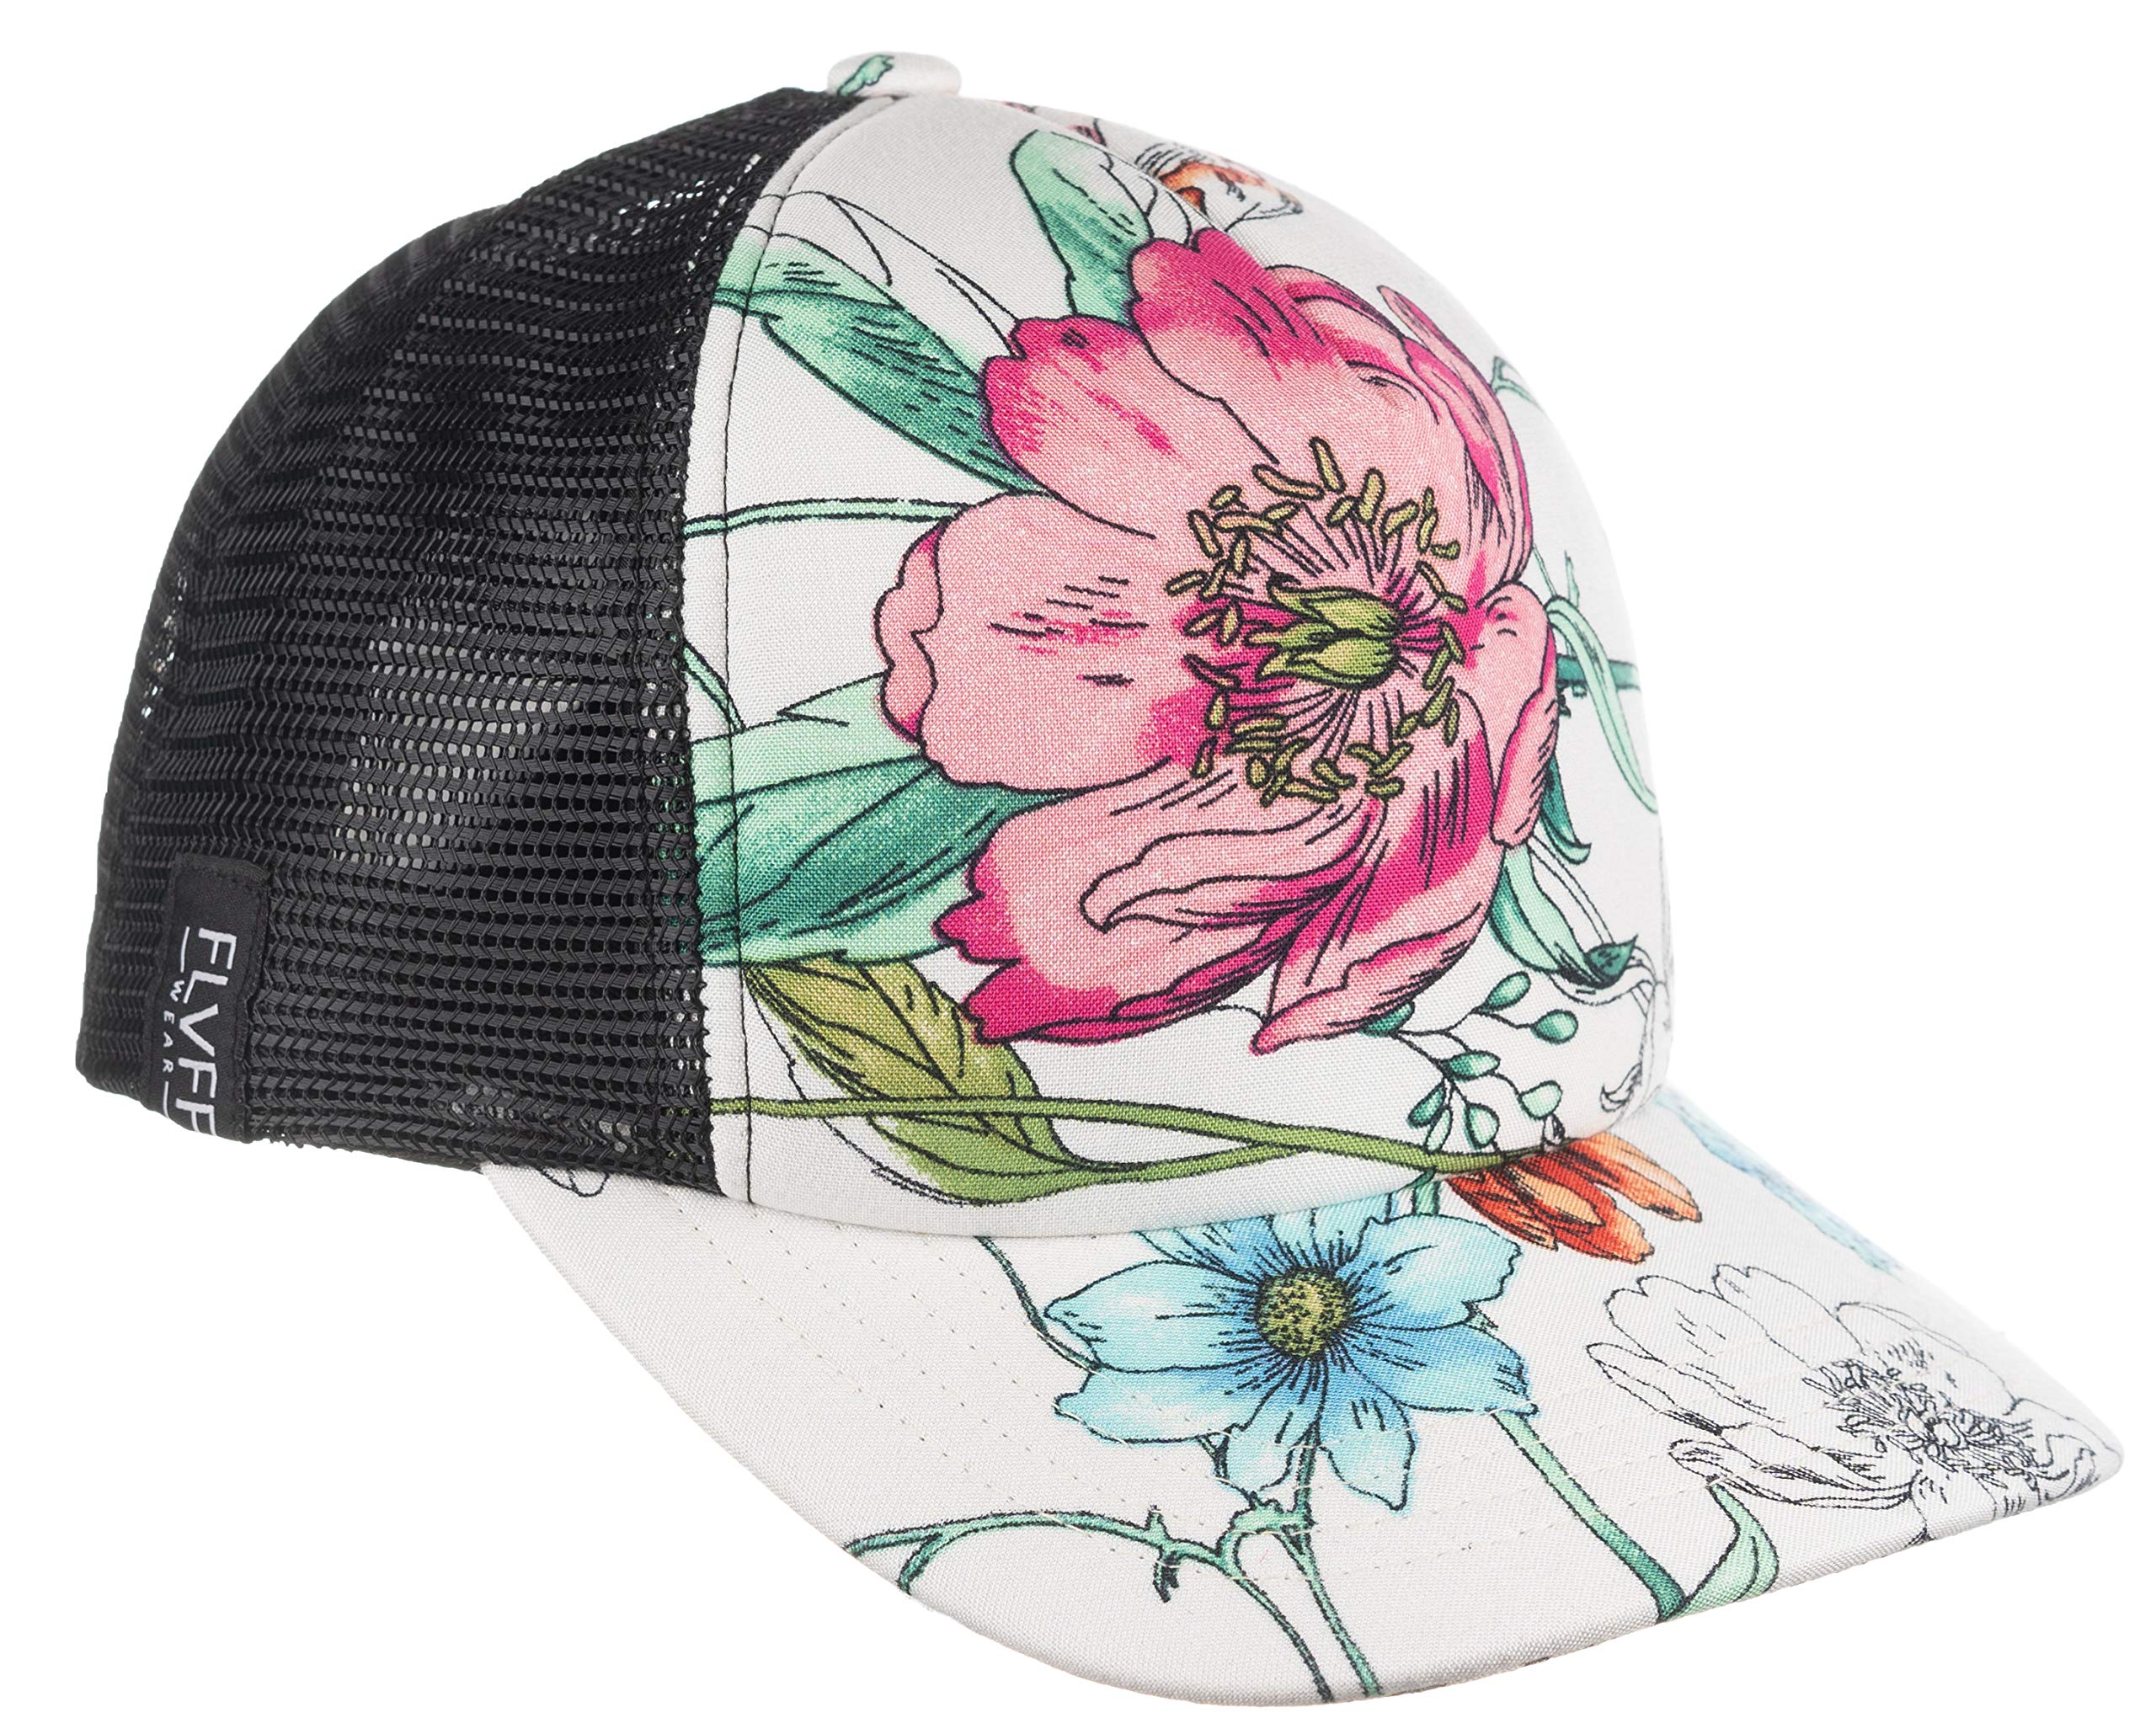 FLVFF Trucker Hat Floral Print Mesh Baseball Cap Adjustable Dad Hats for Women & Men Moldable Brim